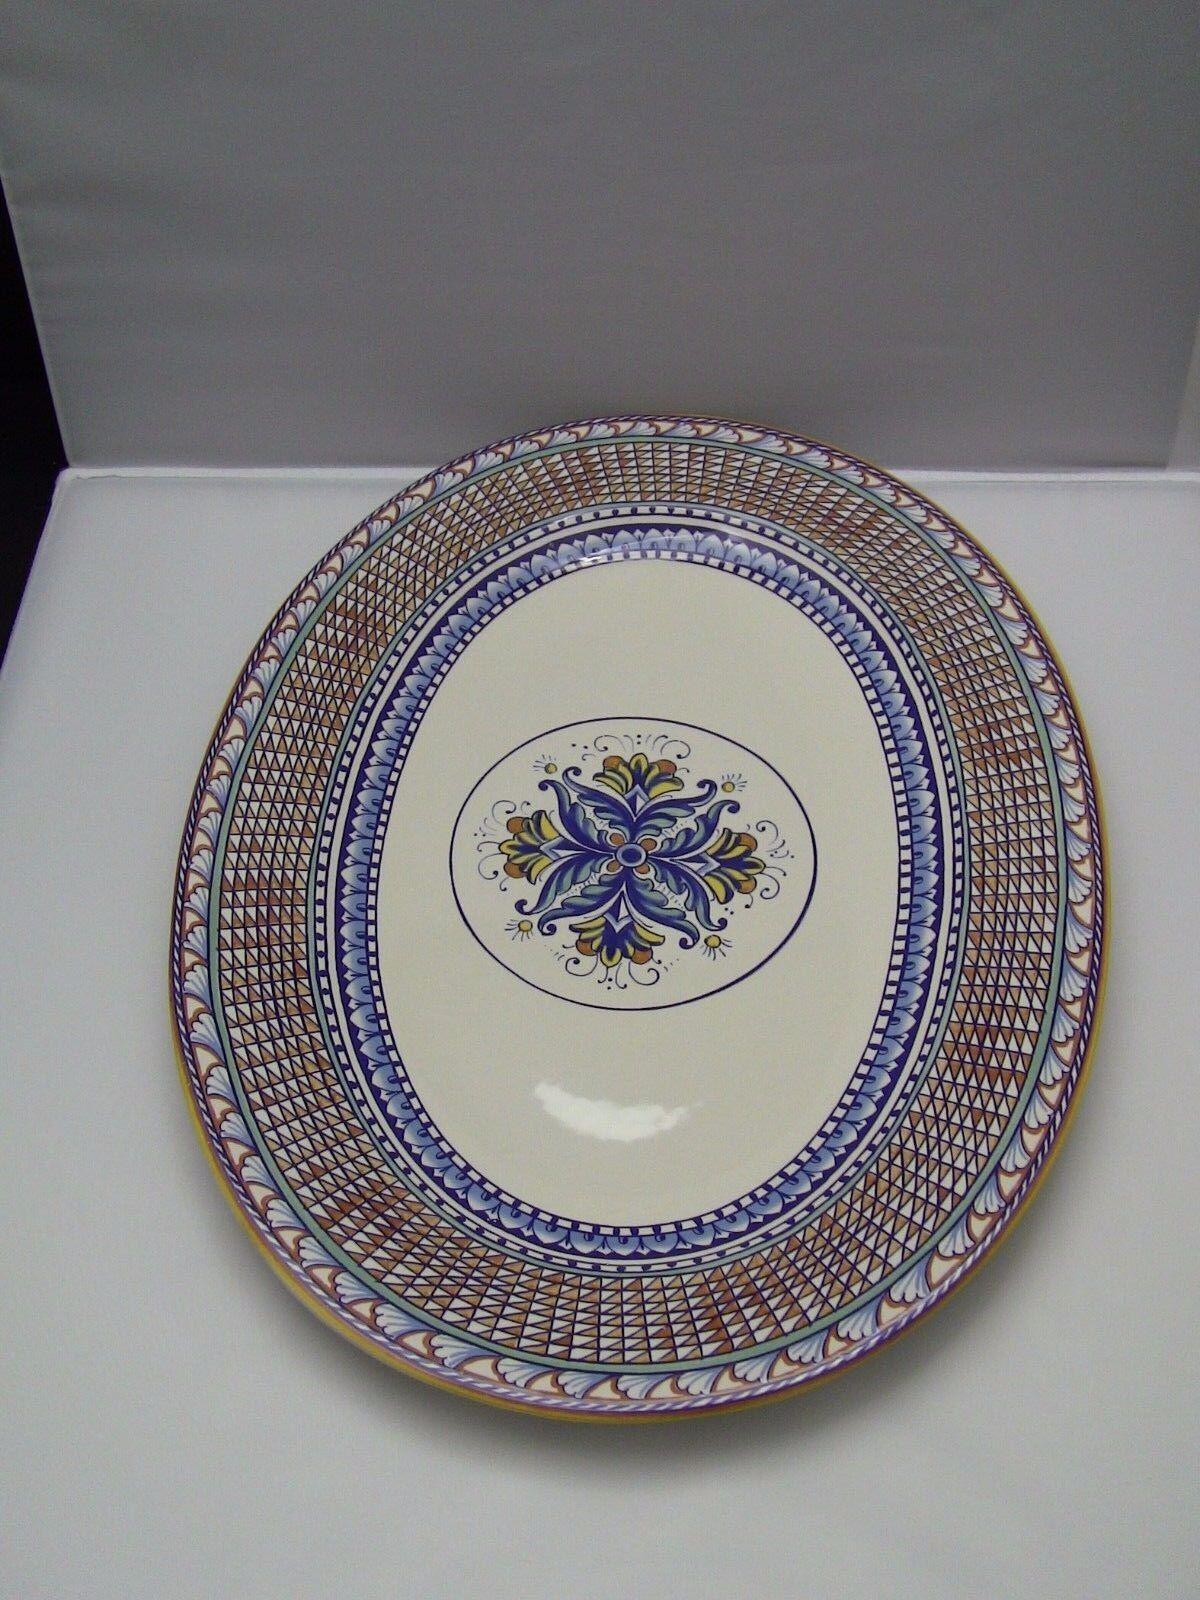 Williams Sonoma Mediterranean Large Oval Serving Platter 20